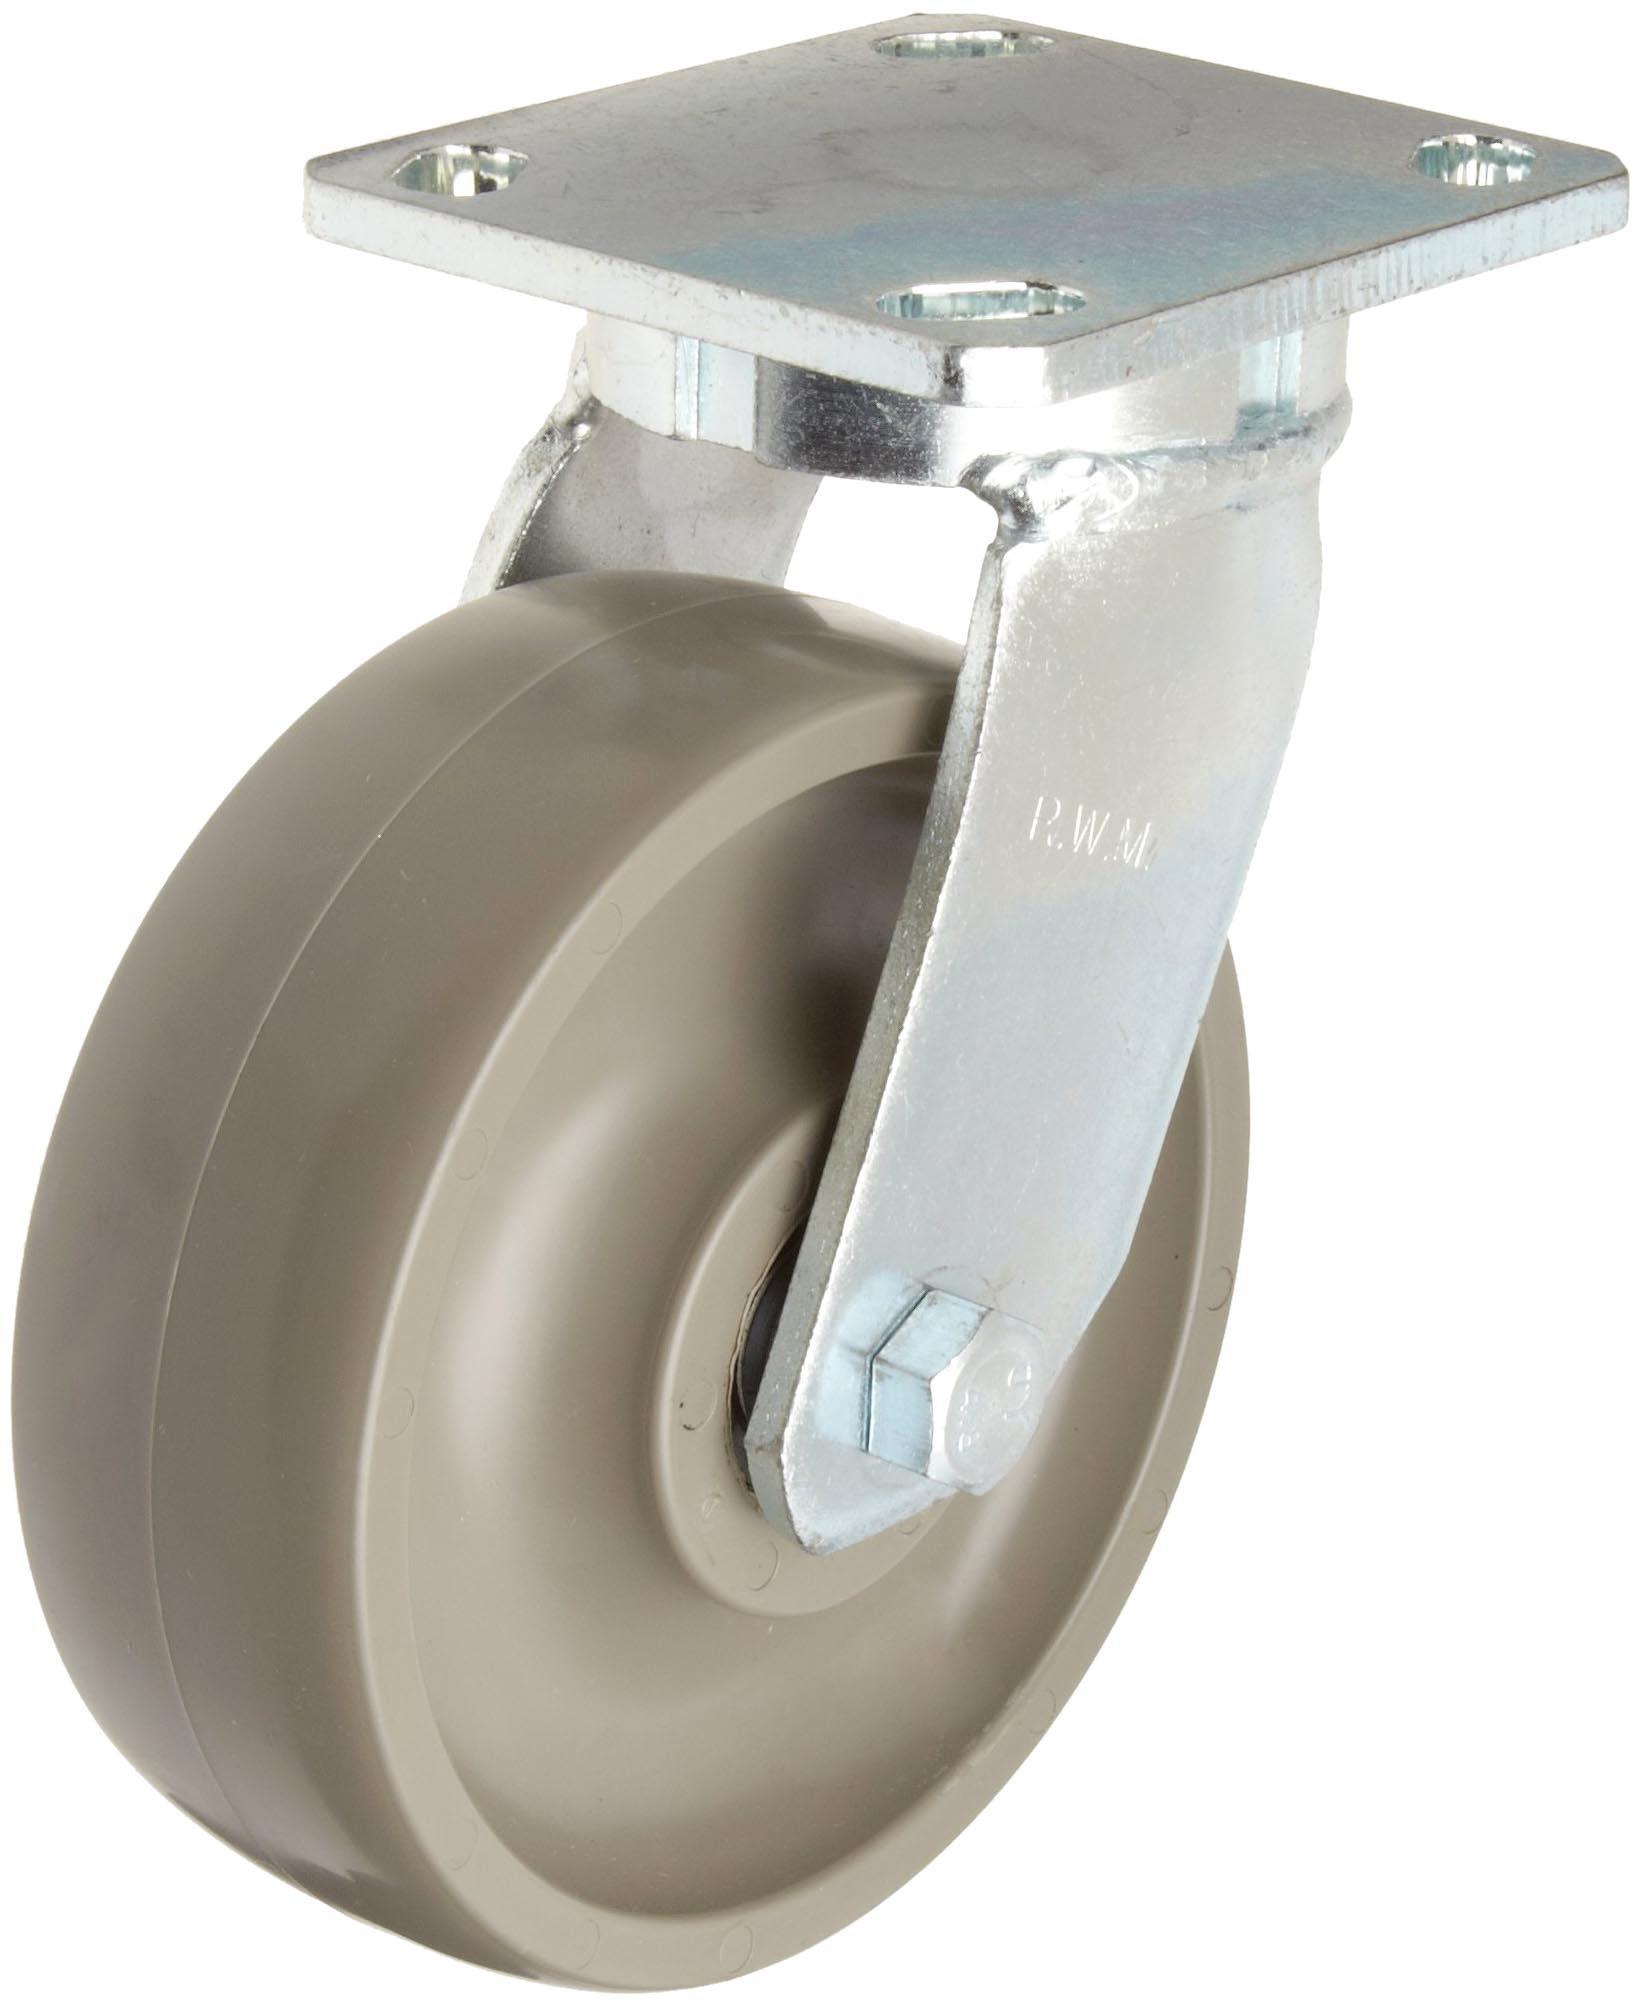 RWM Casters 65 Series Plate Caster, Swivel, Kingpinless, Urethane on Aluminum Wheel, Ball Bearing, 1500 lbs Capacity, 8'' Wheel Dia, 2'' Wheel Width, 10-1/8'' Mount Height, 4-1/2'' Plate Length, 4'' Plate Width